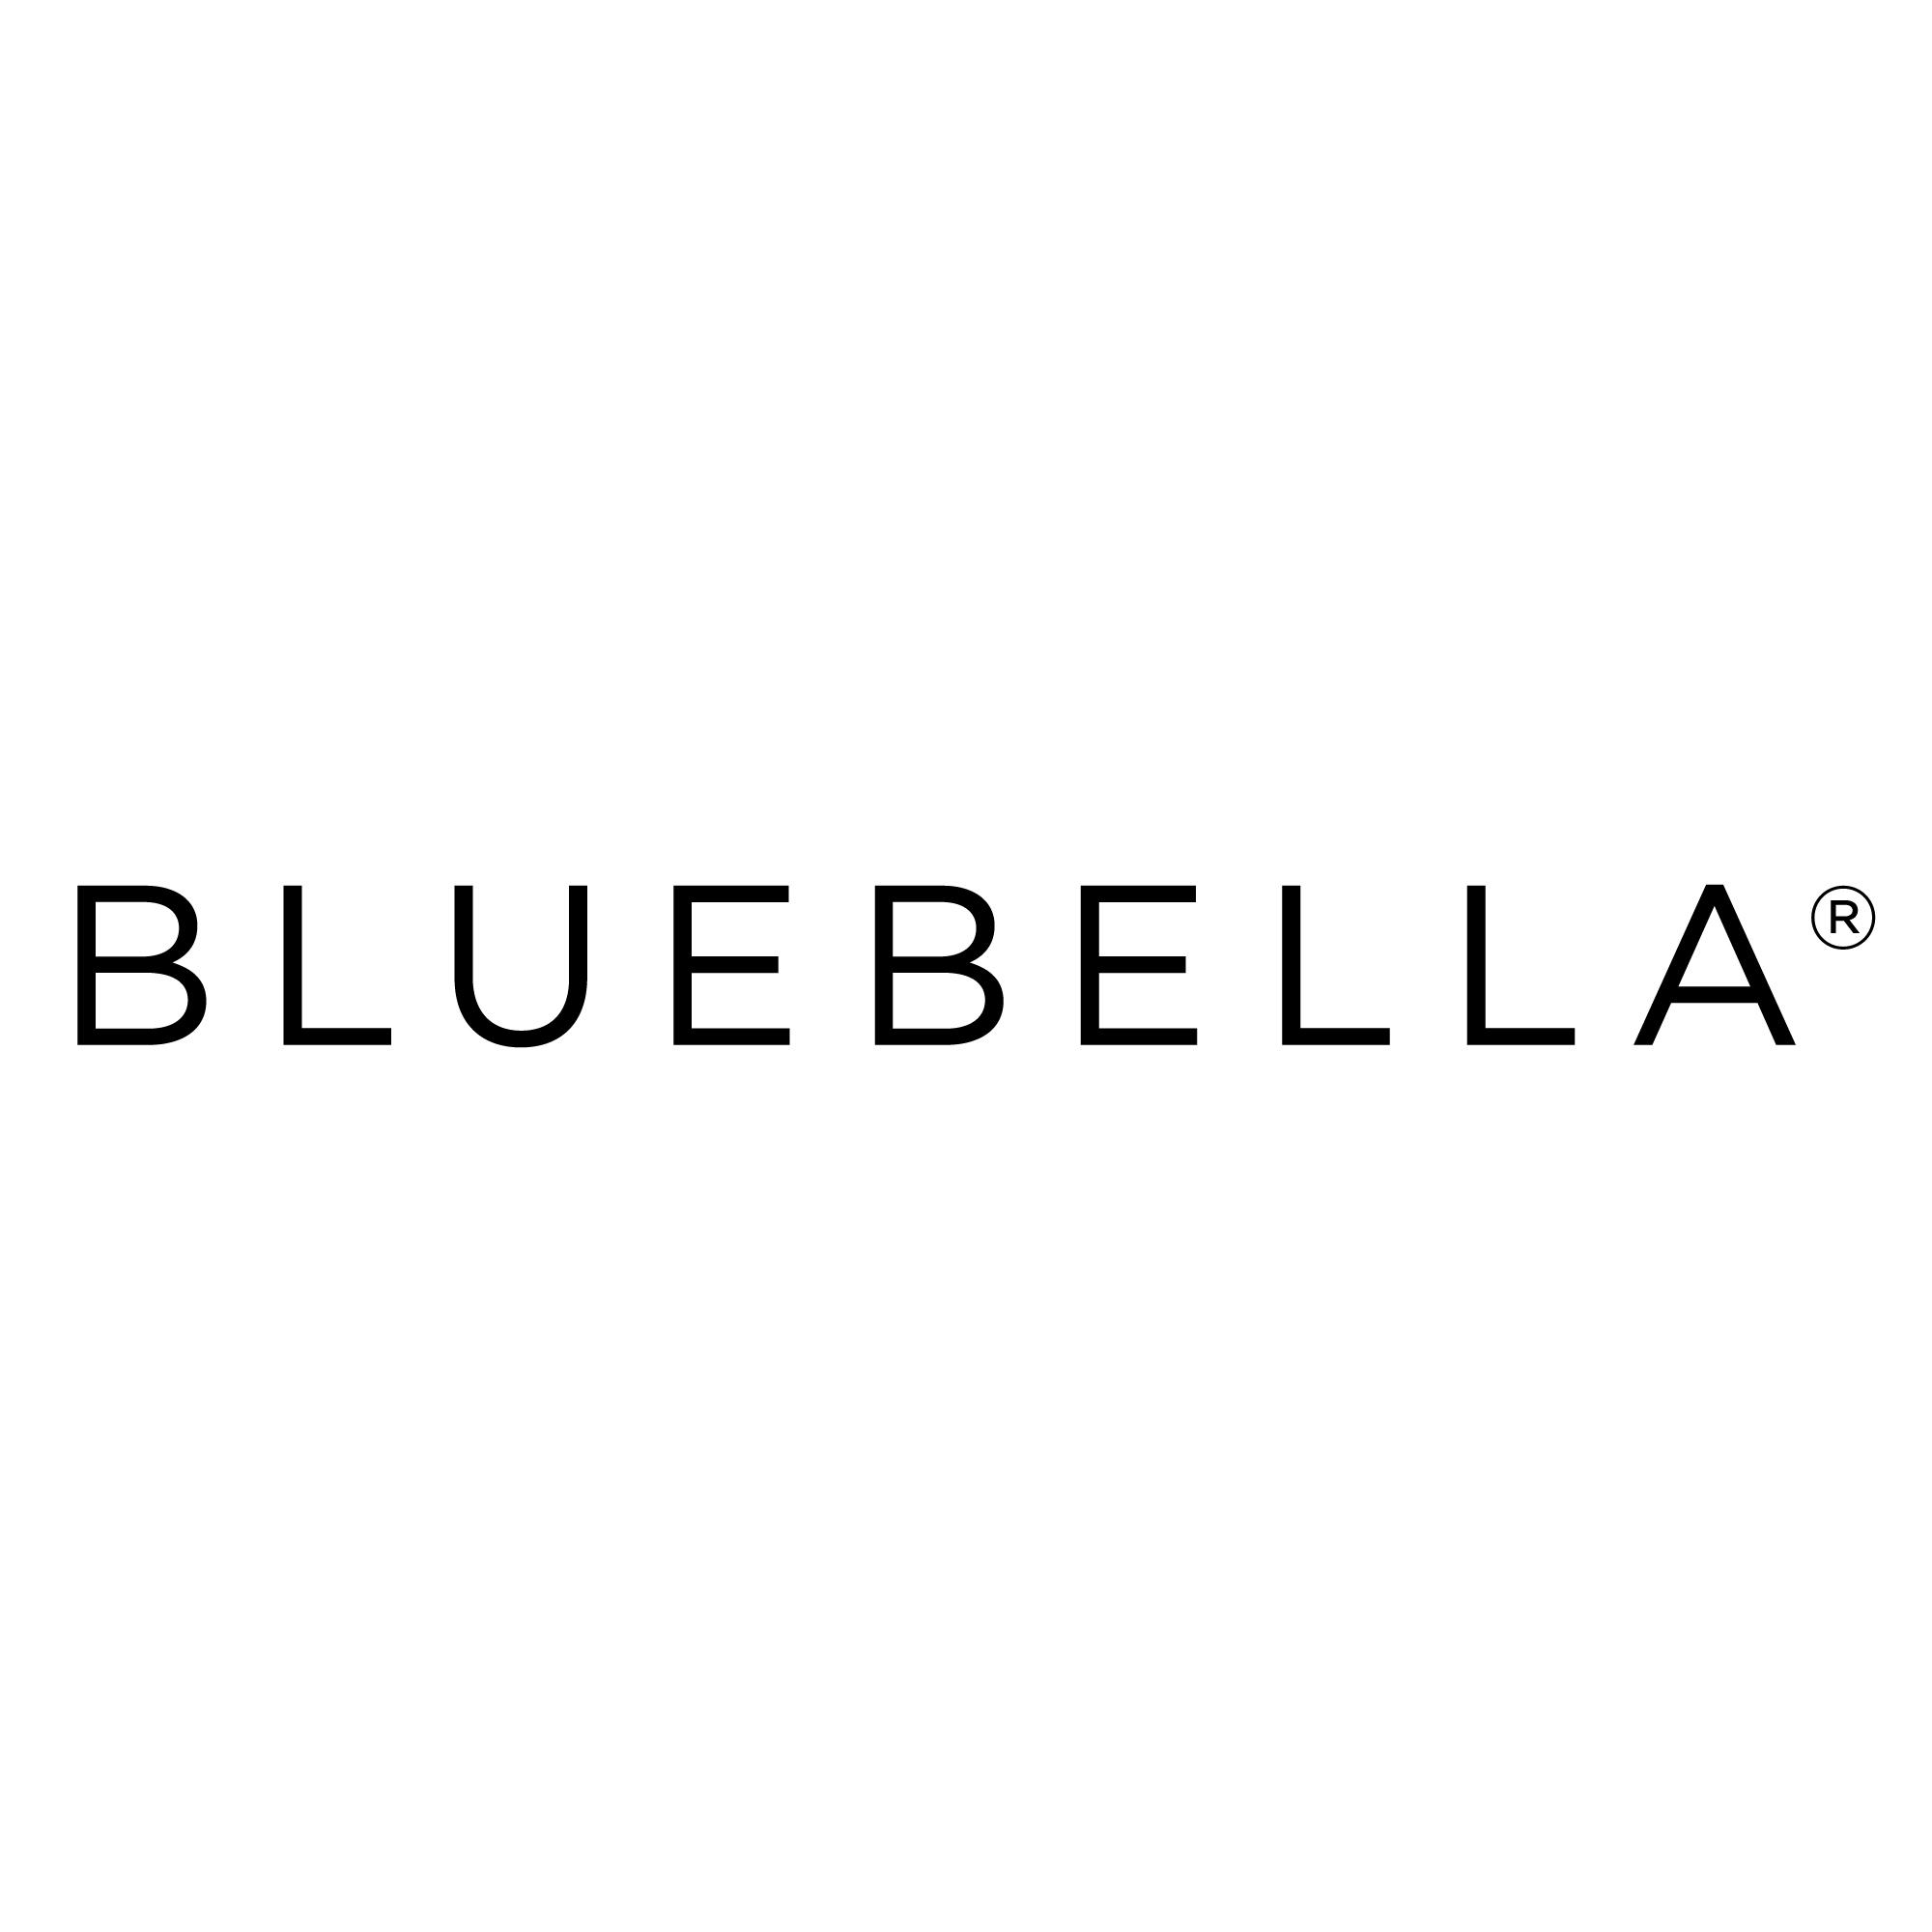 bluebella.png